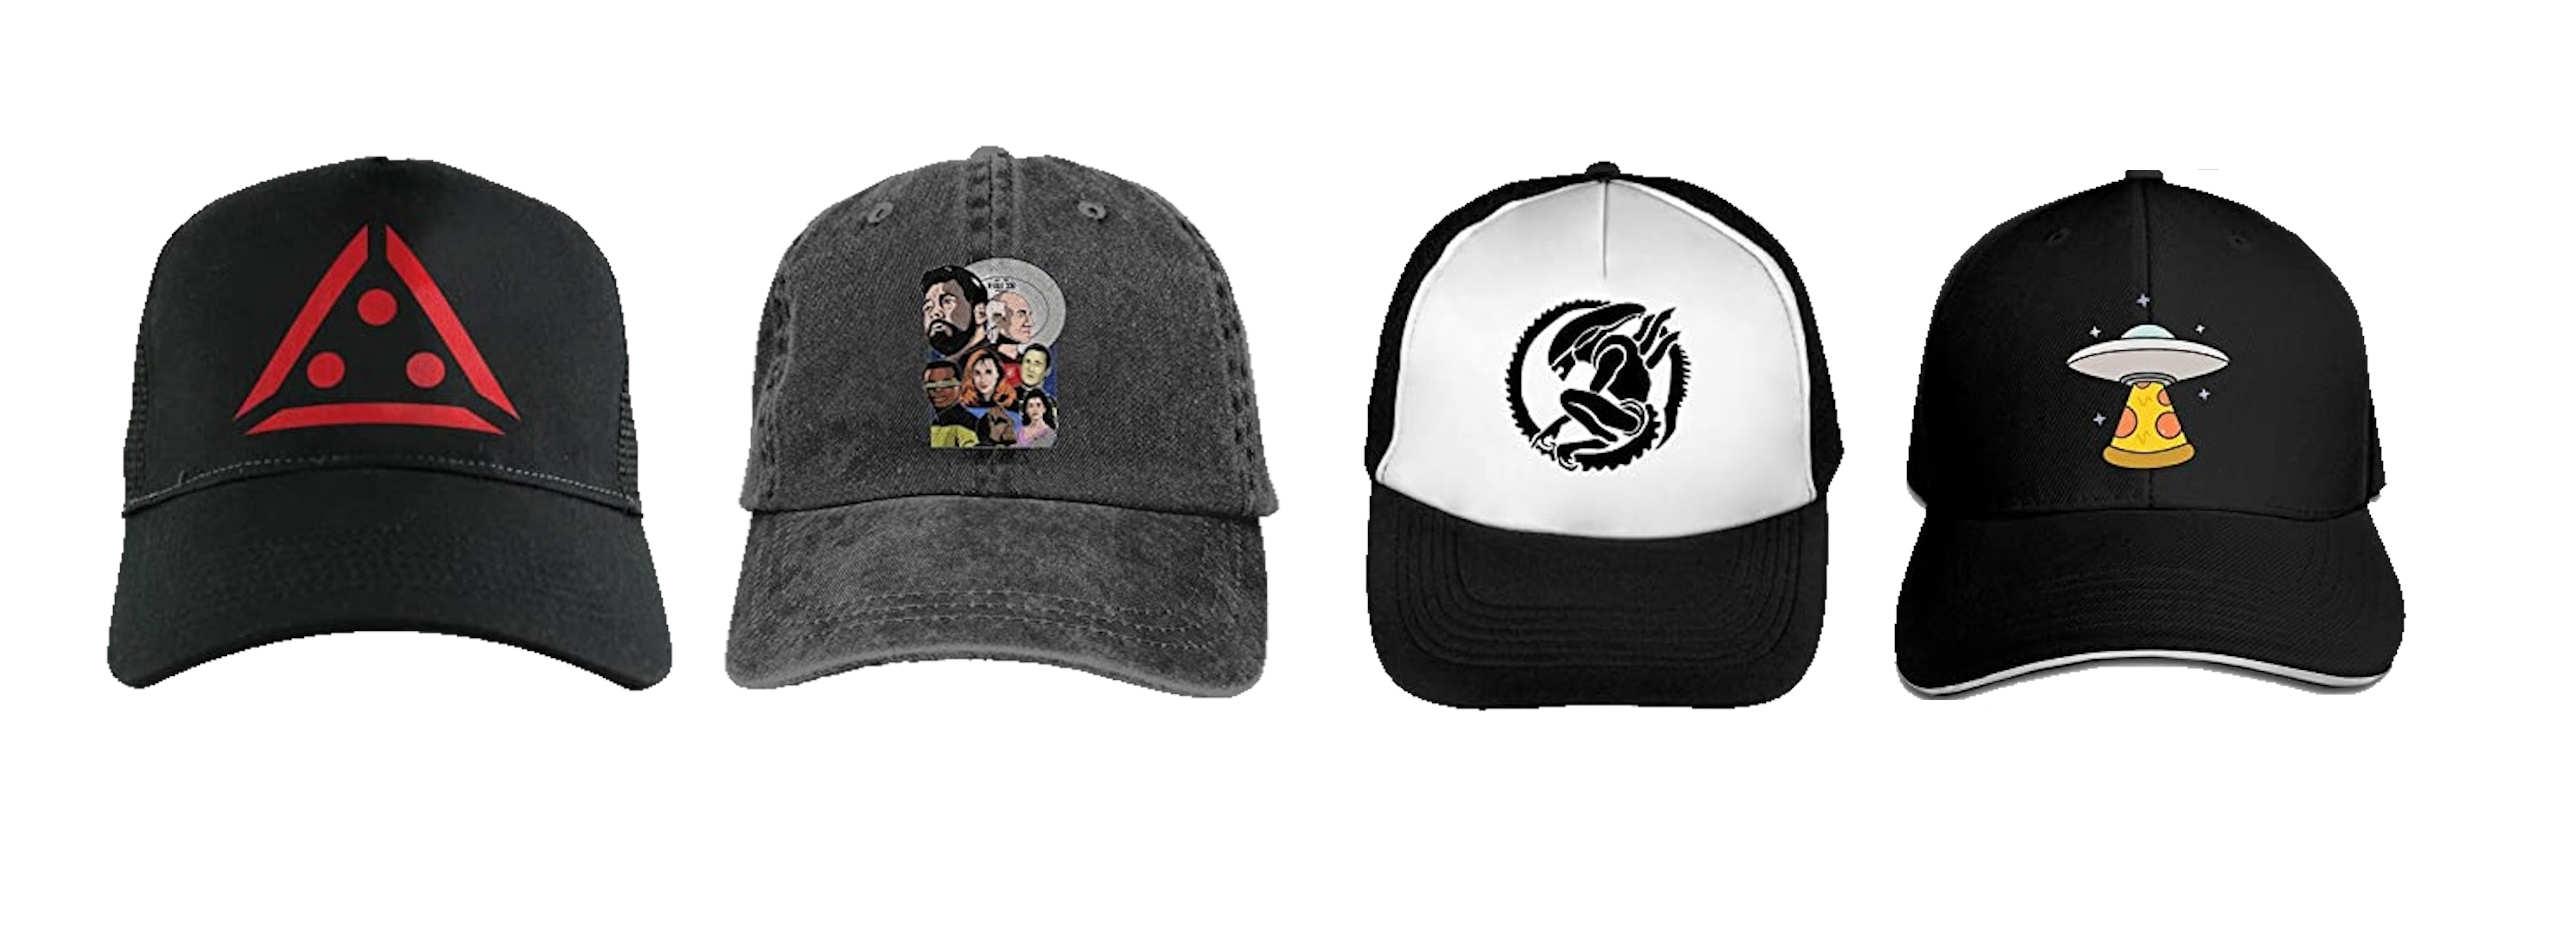 gorras de alienígenas, gorras de aliens, gorras de et, gorras de xenormorfo, gorras de star trek, gorras de predator, gorras de extraterrestres, gorras de ovnis, gorras ufo